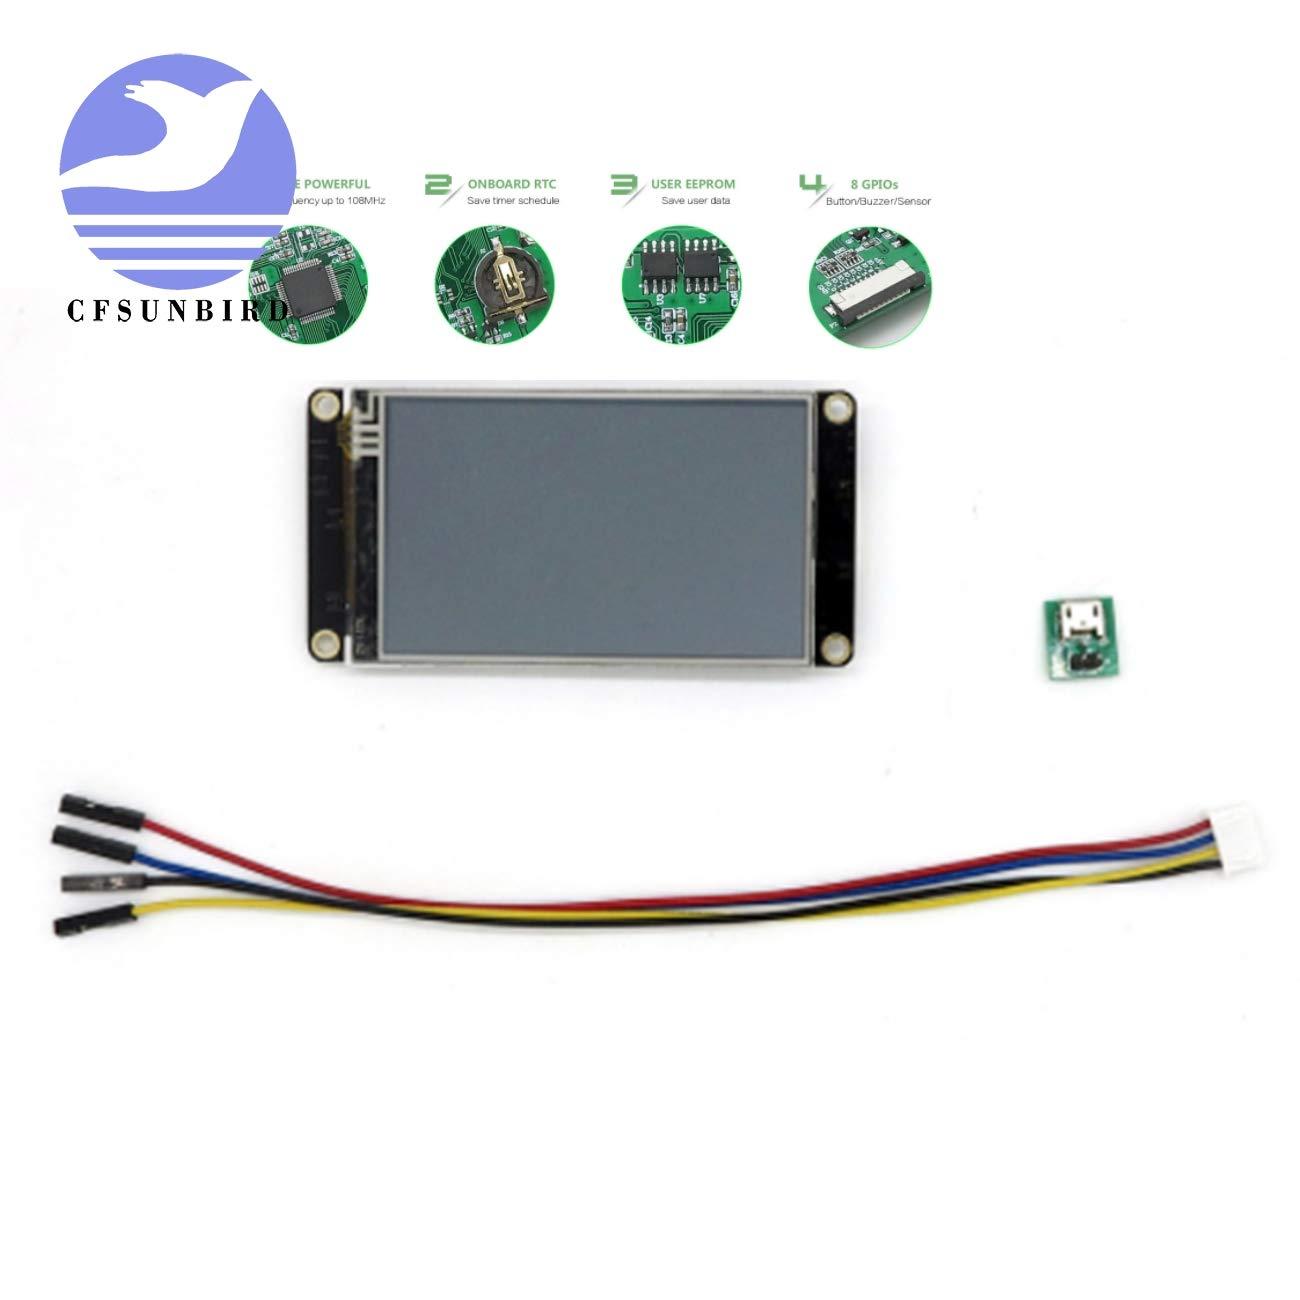 CFsunbird Nextion Enhanced 3.2'' LED Display HMI Touch Display Suppport Memory Care Raspberry Pi by DIY